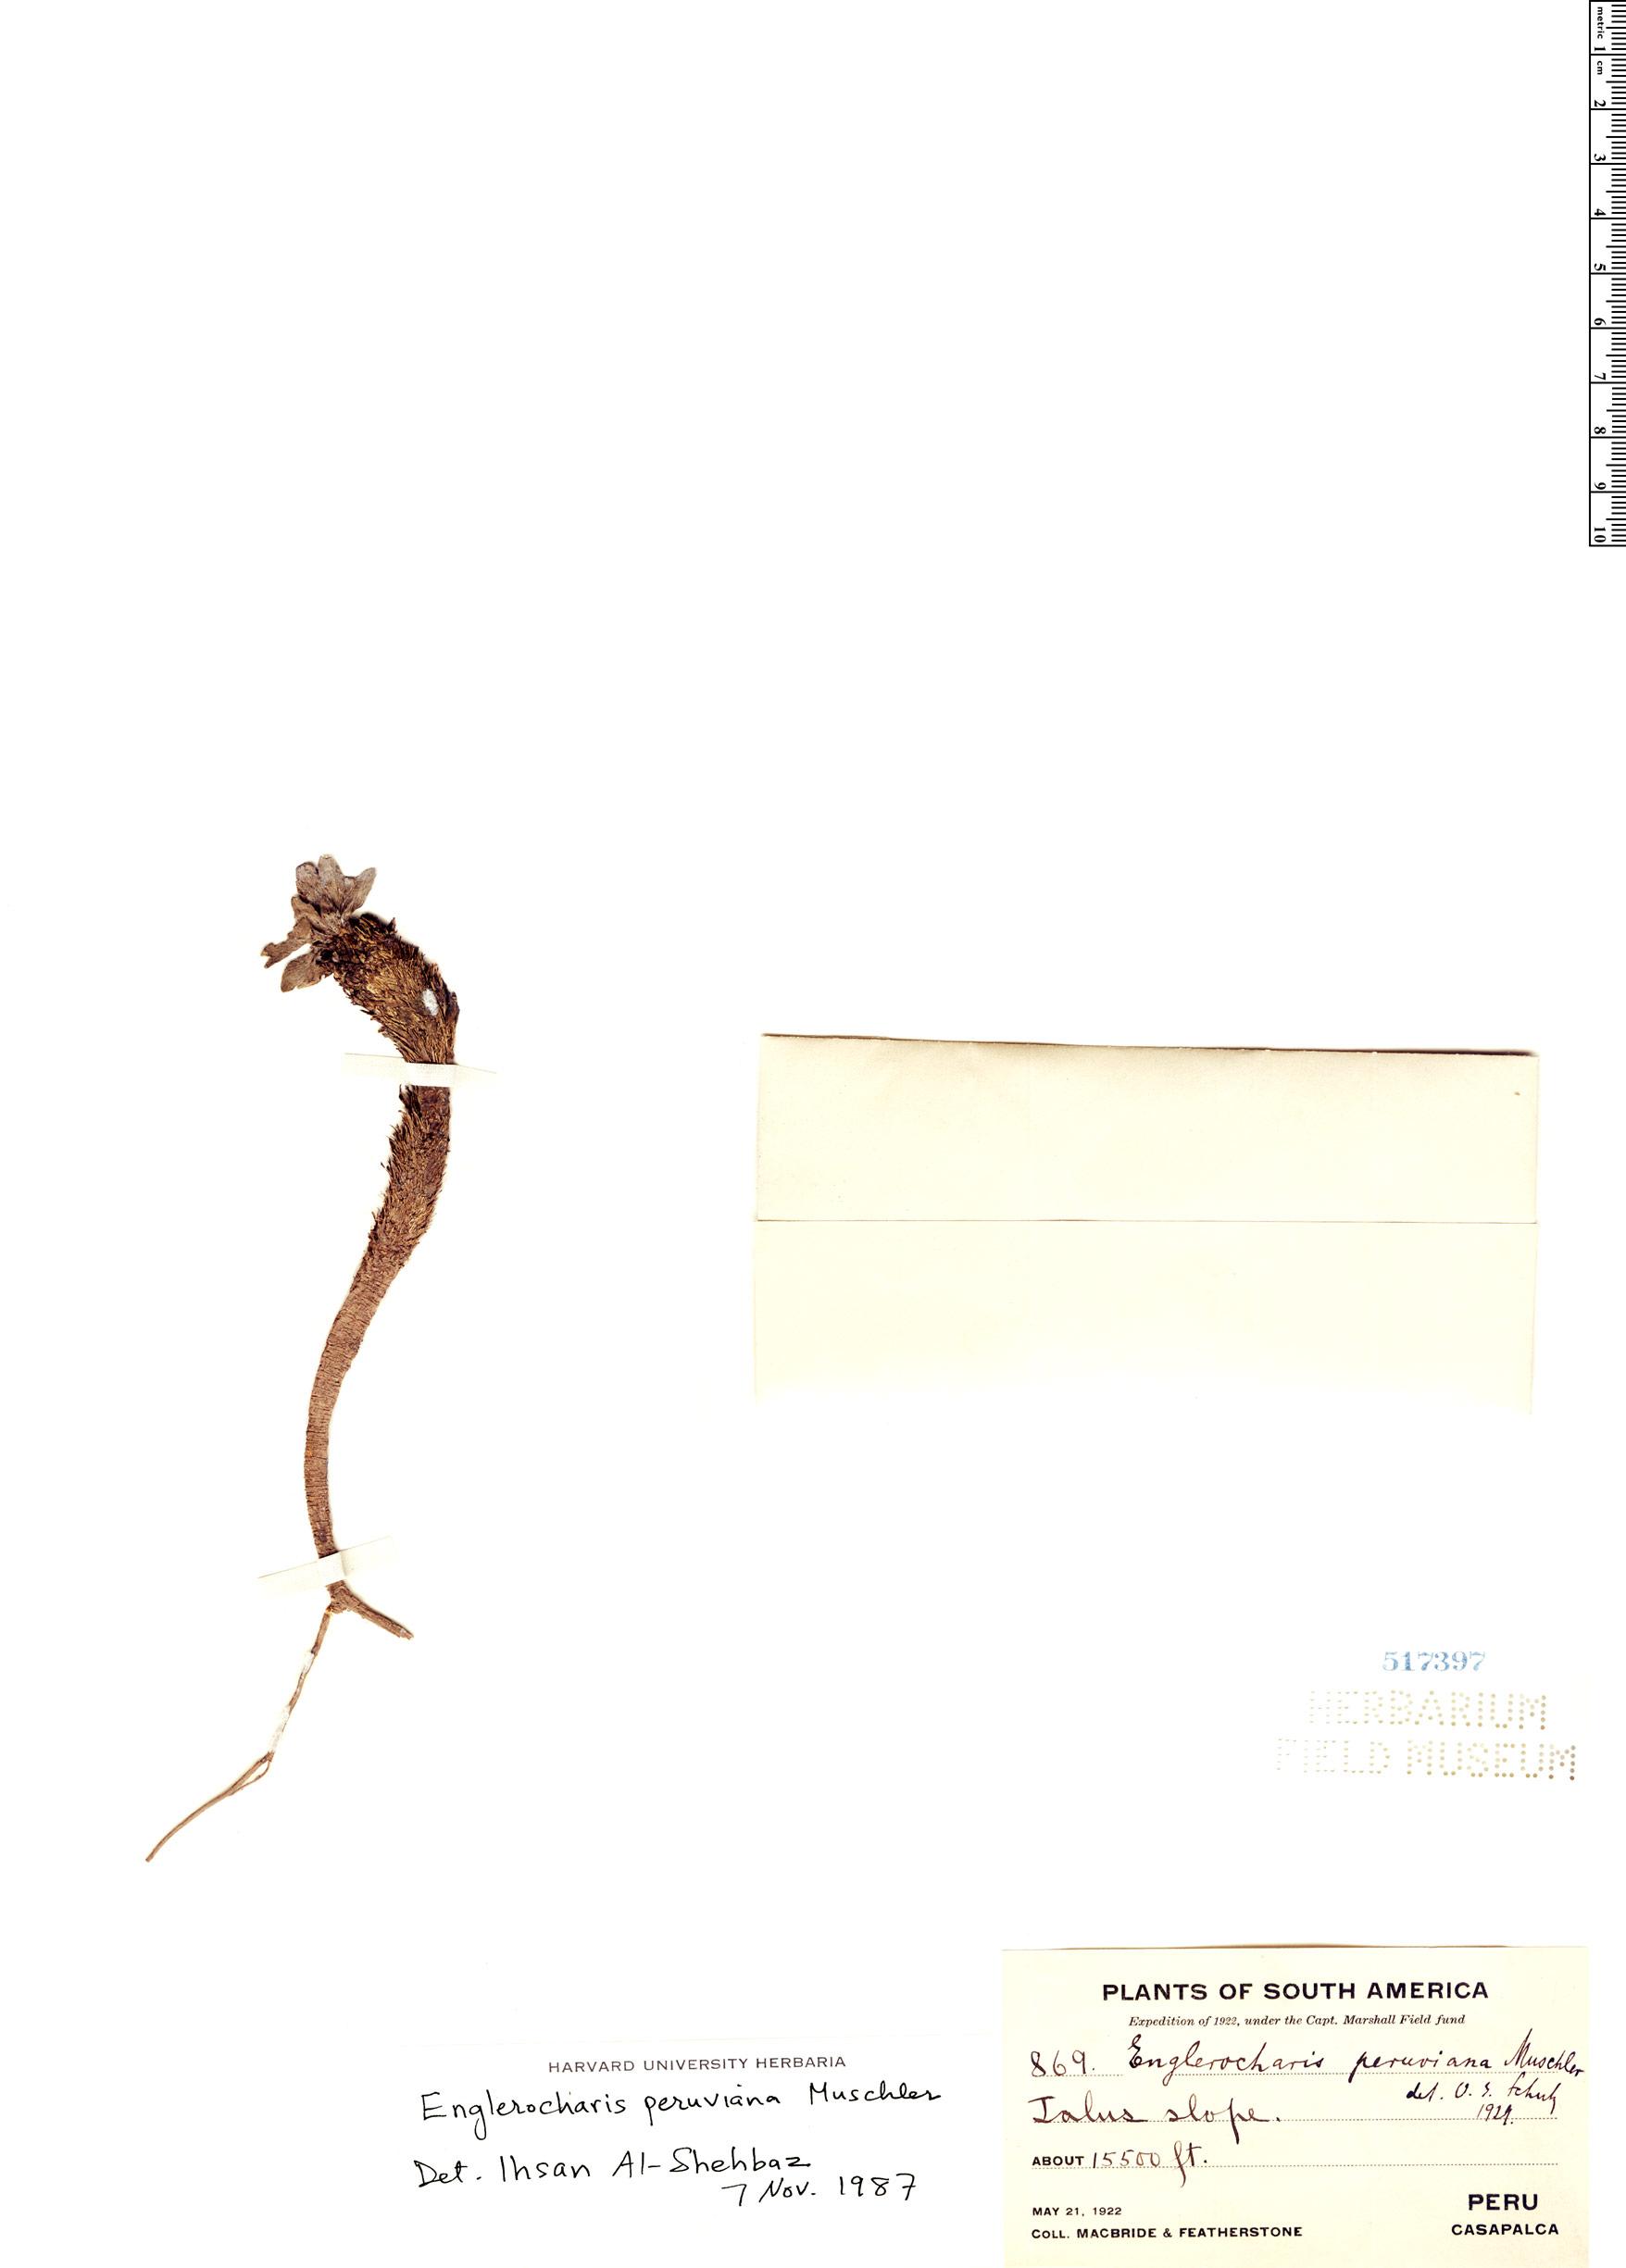 Specimen: Englerocharis peruviana